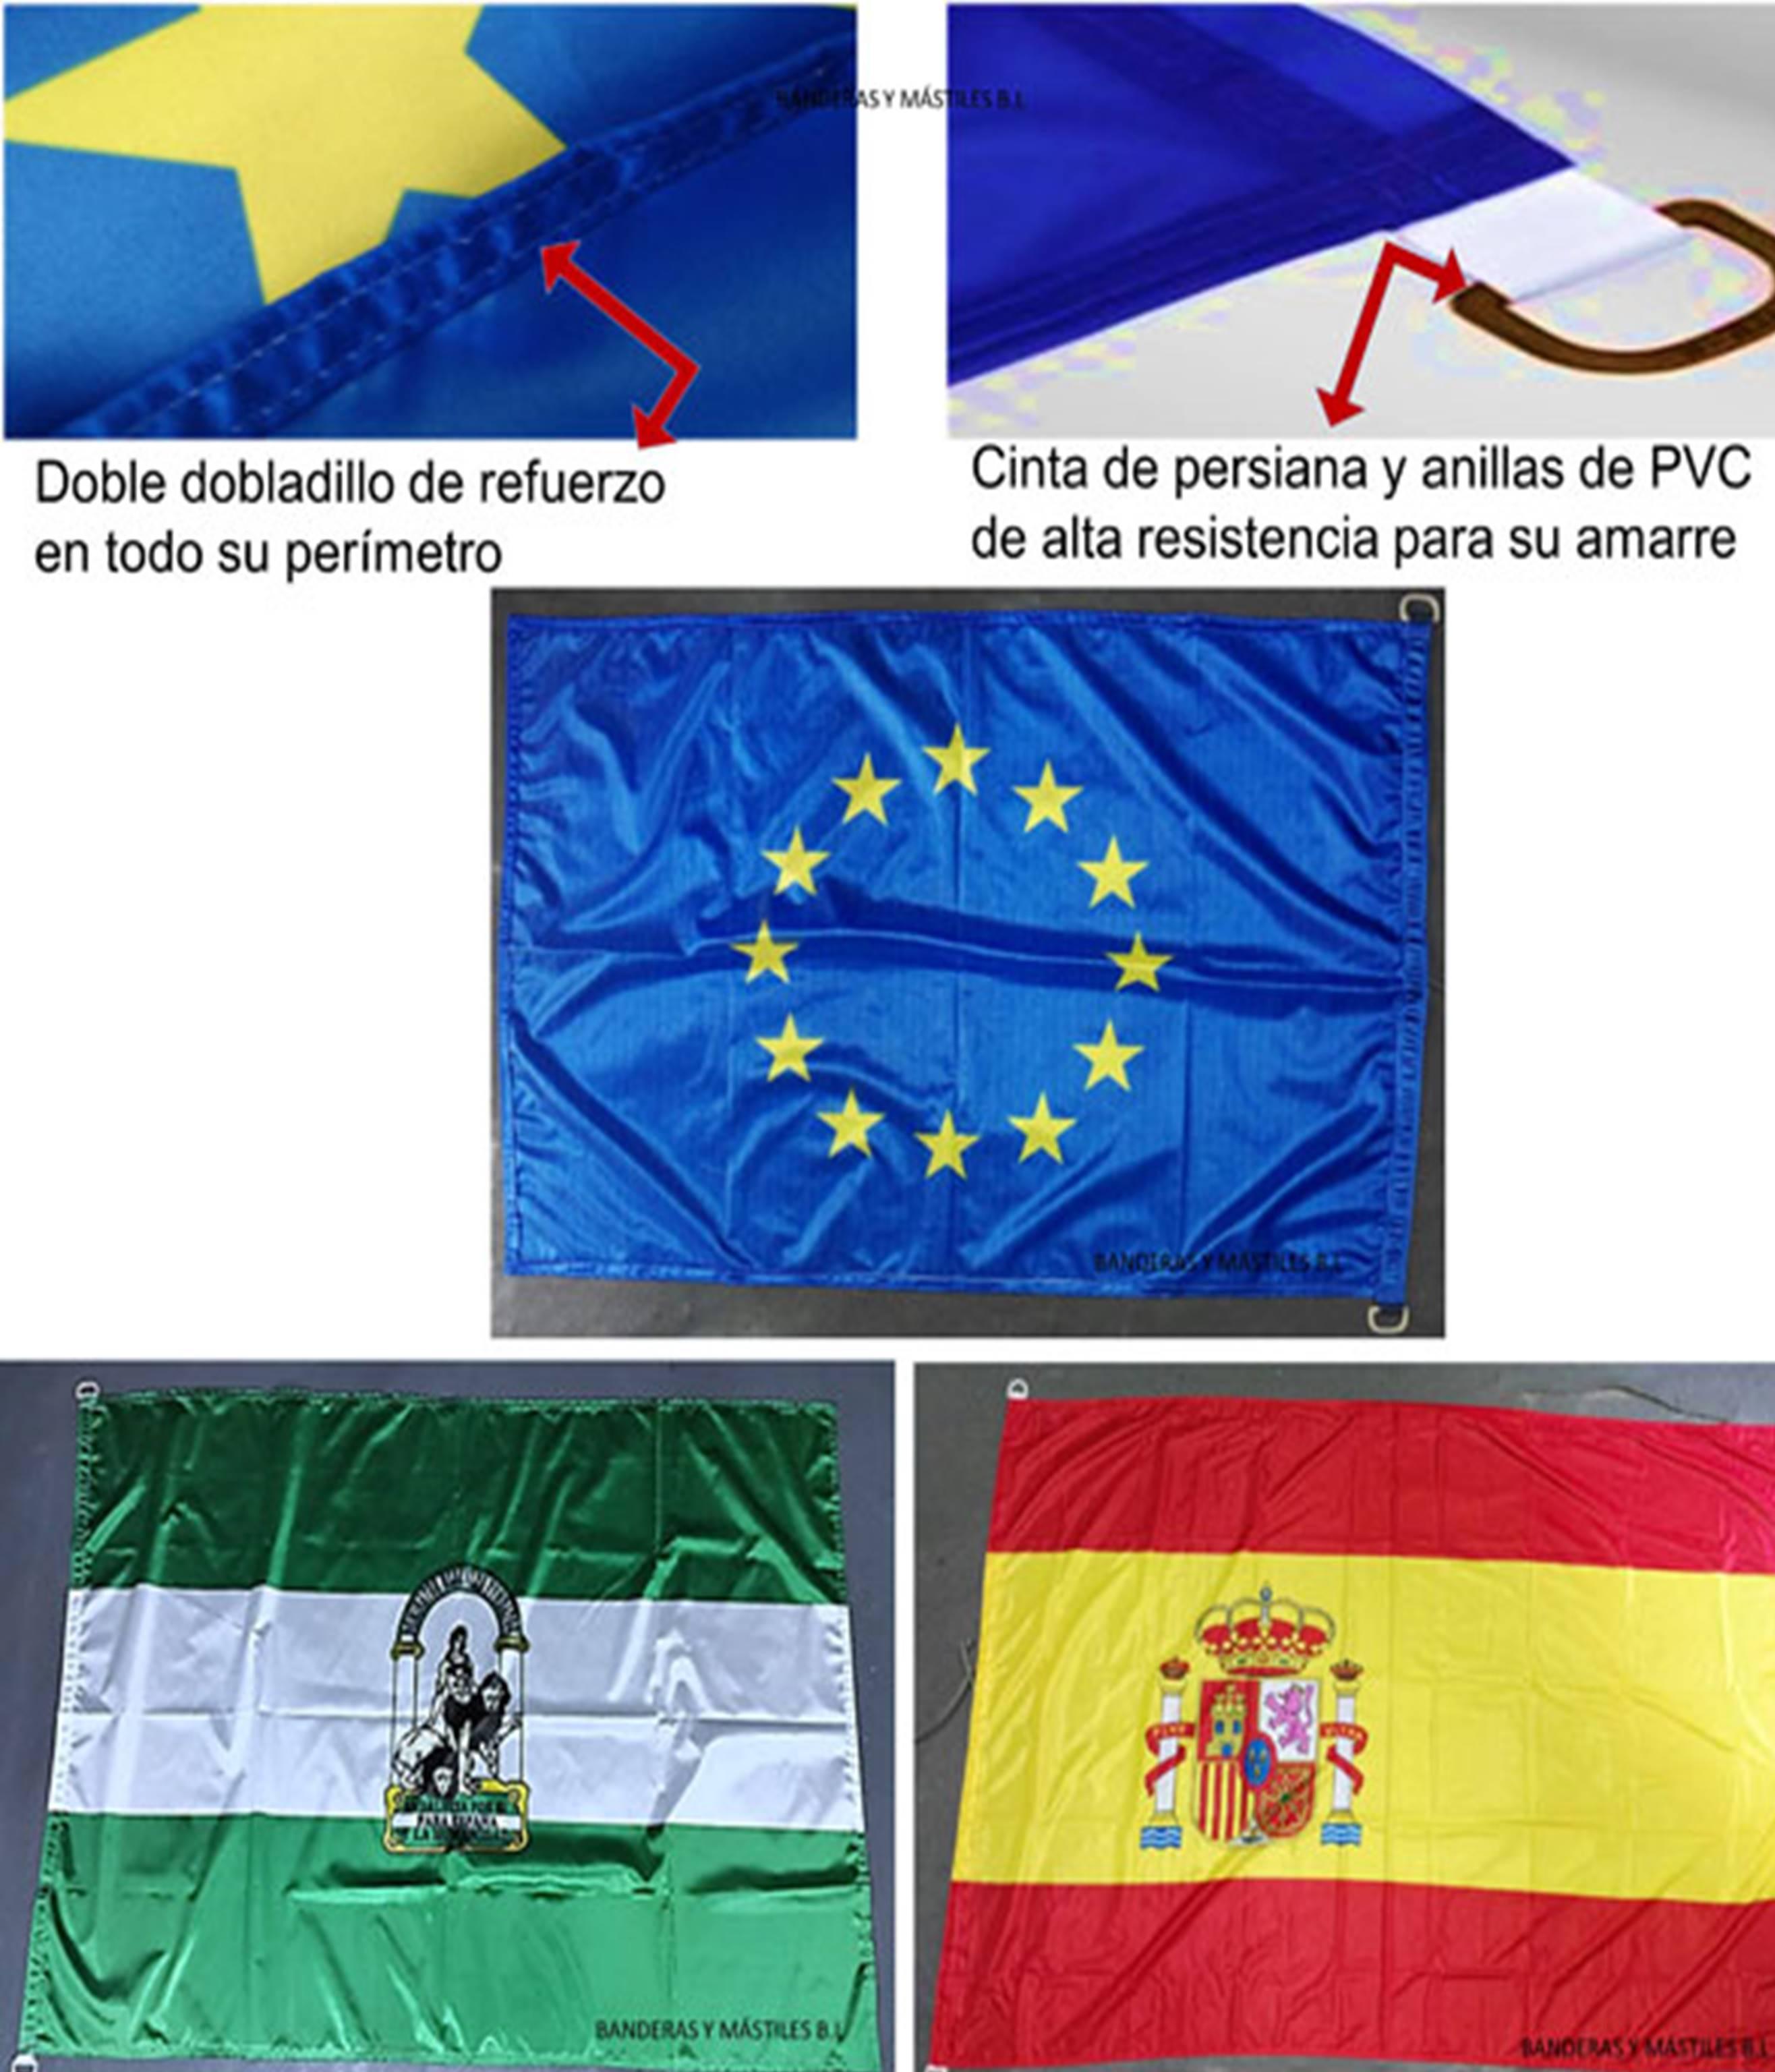 banderas de exterior paises